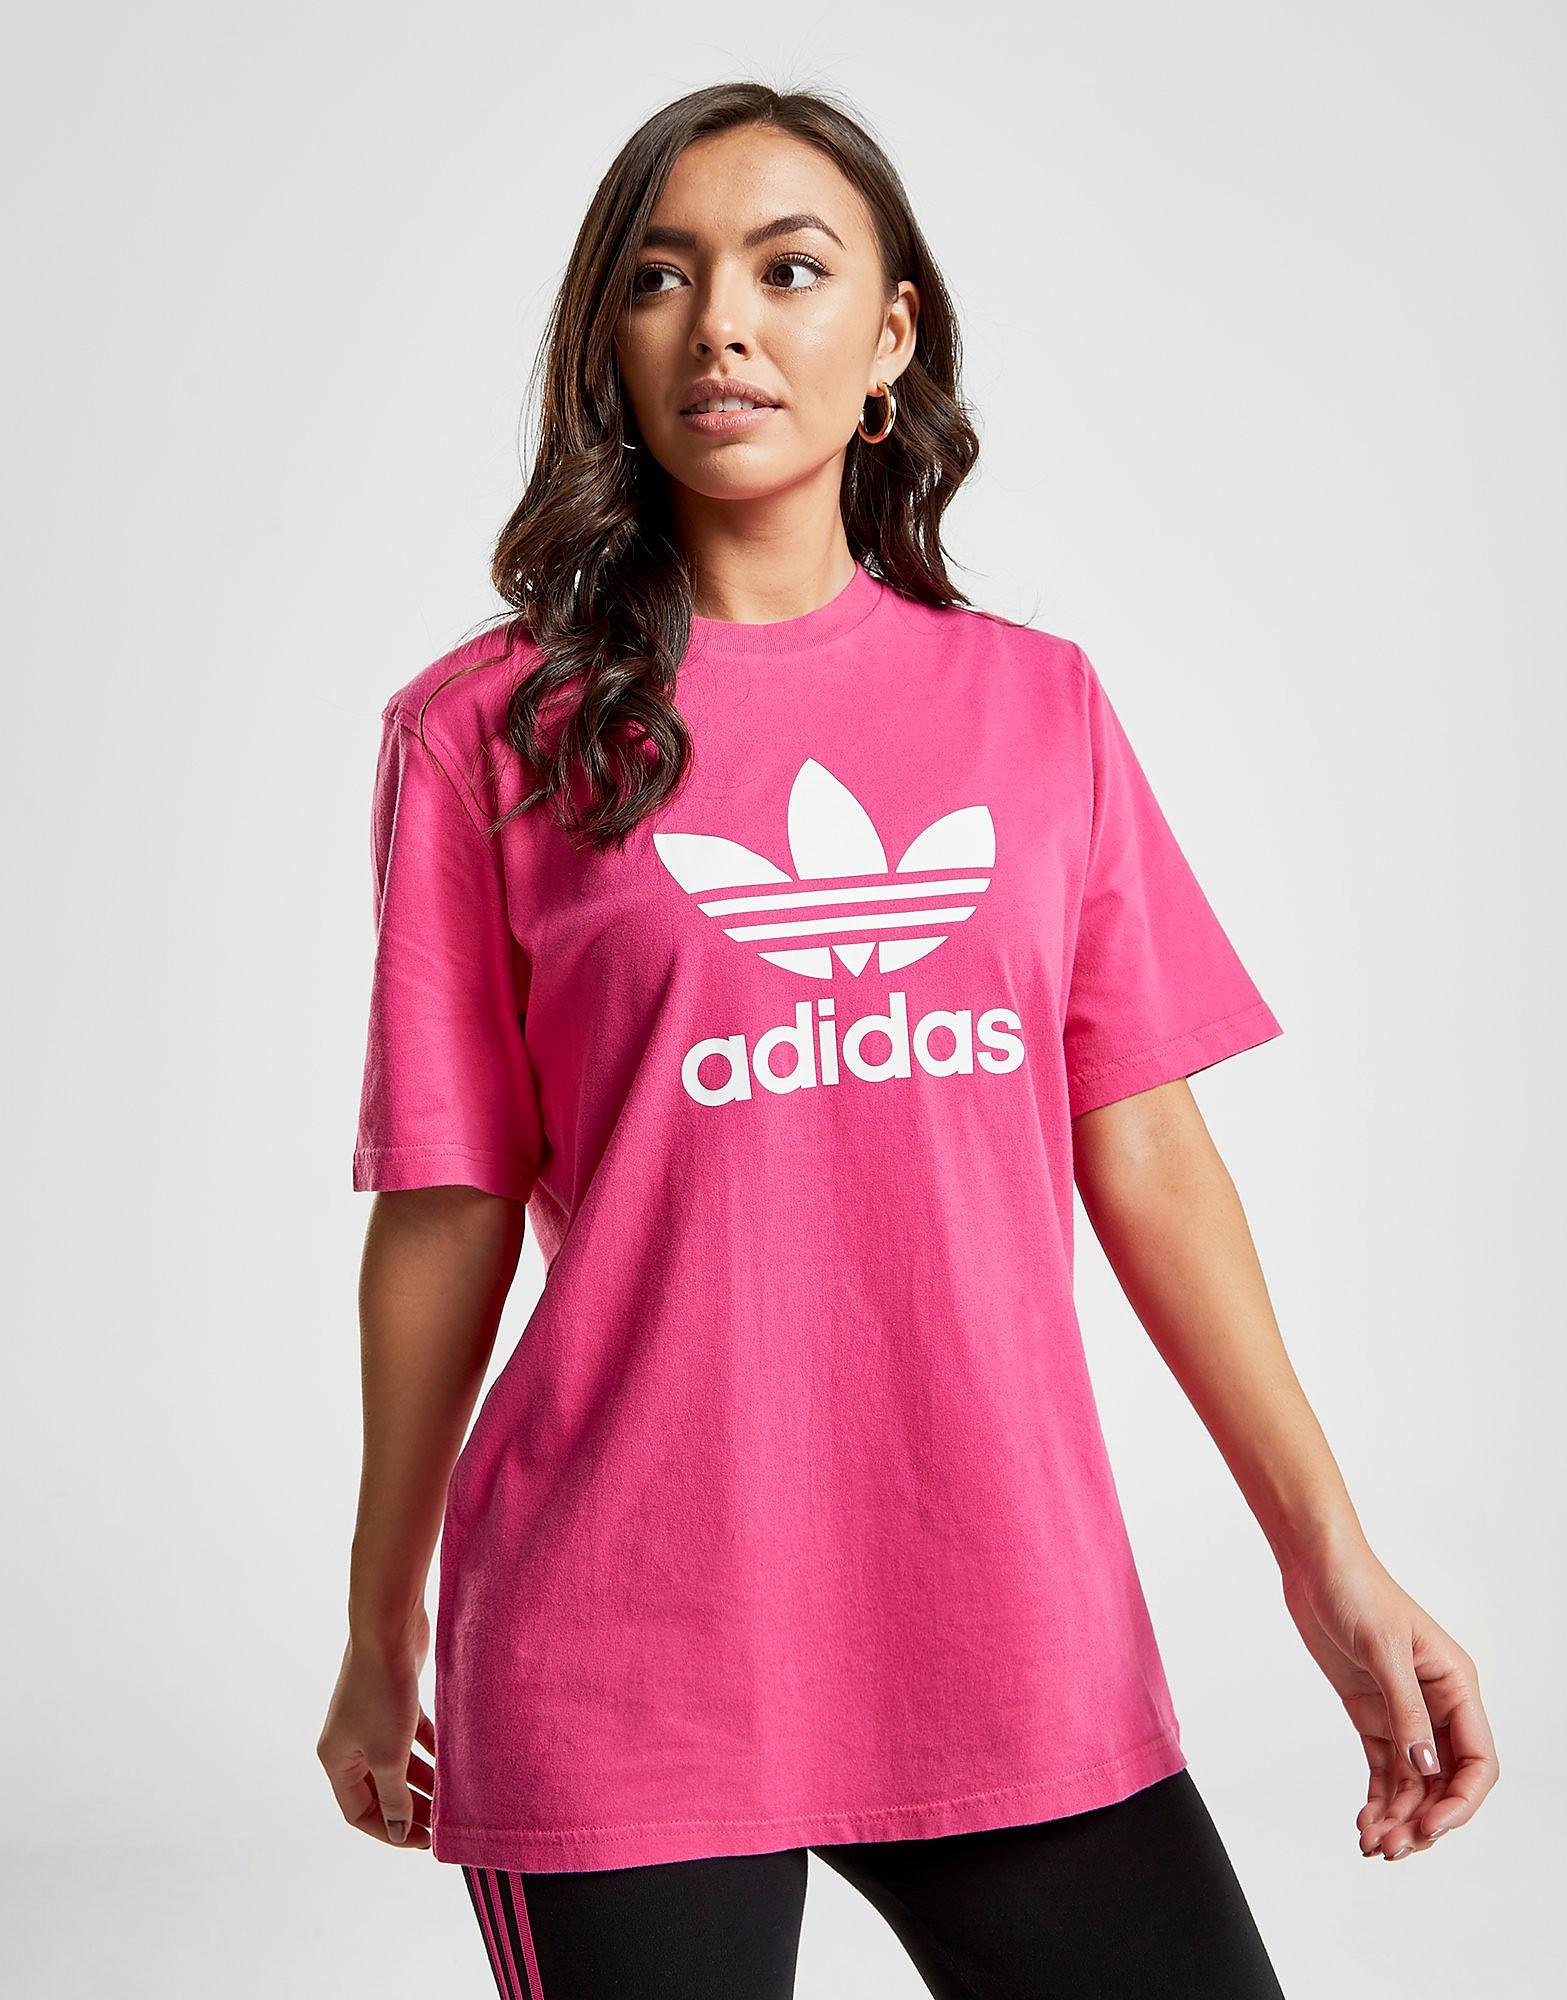 adidas Originals Trefoil T-Shirt - Roze - Dames